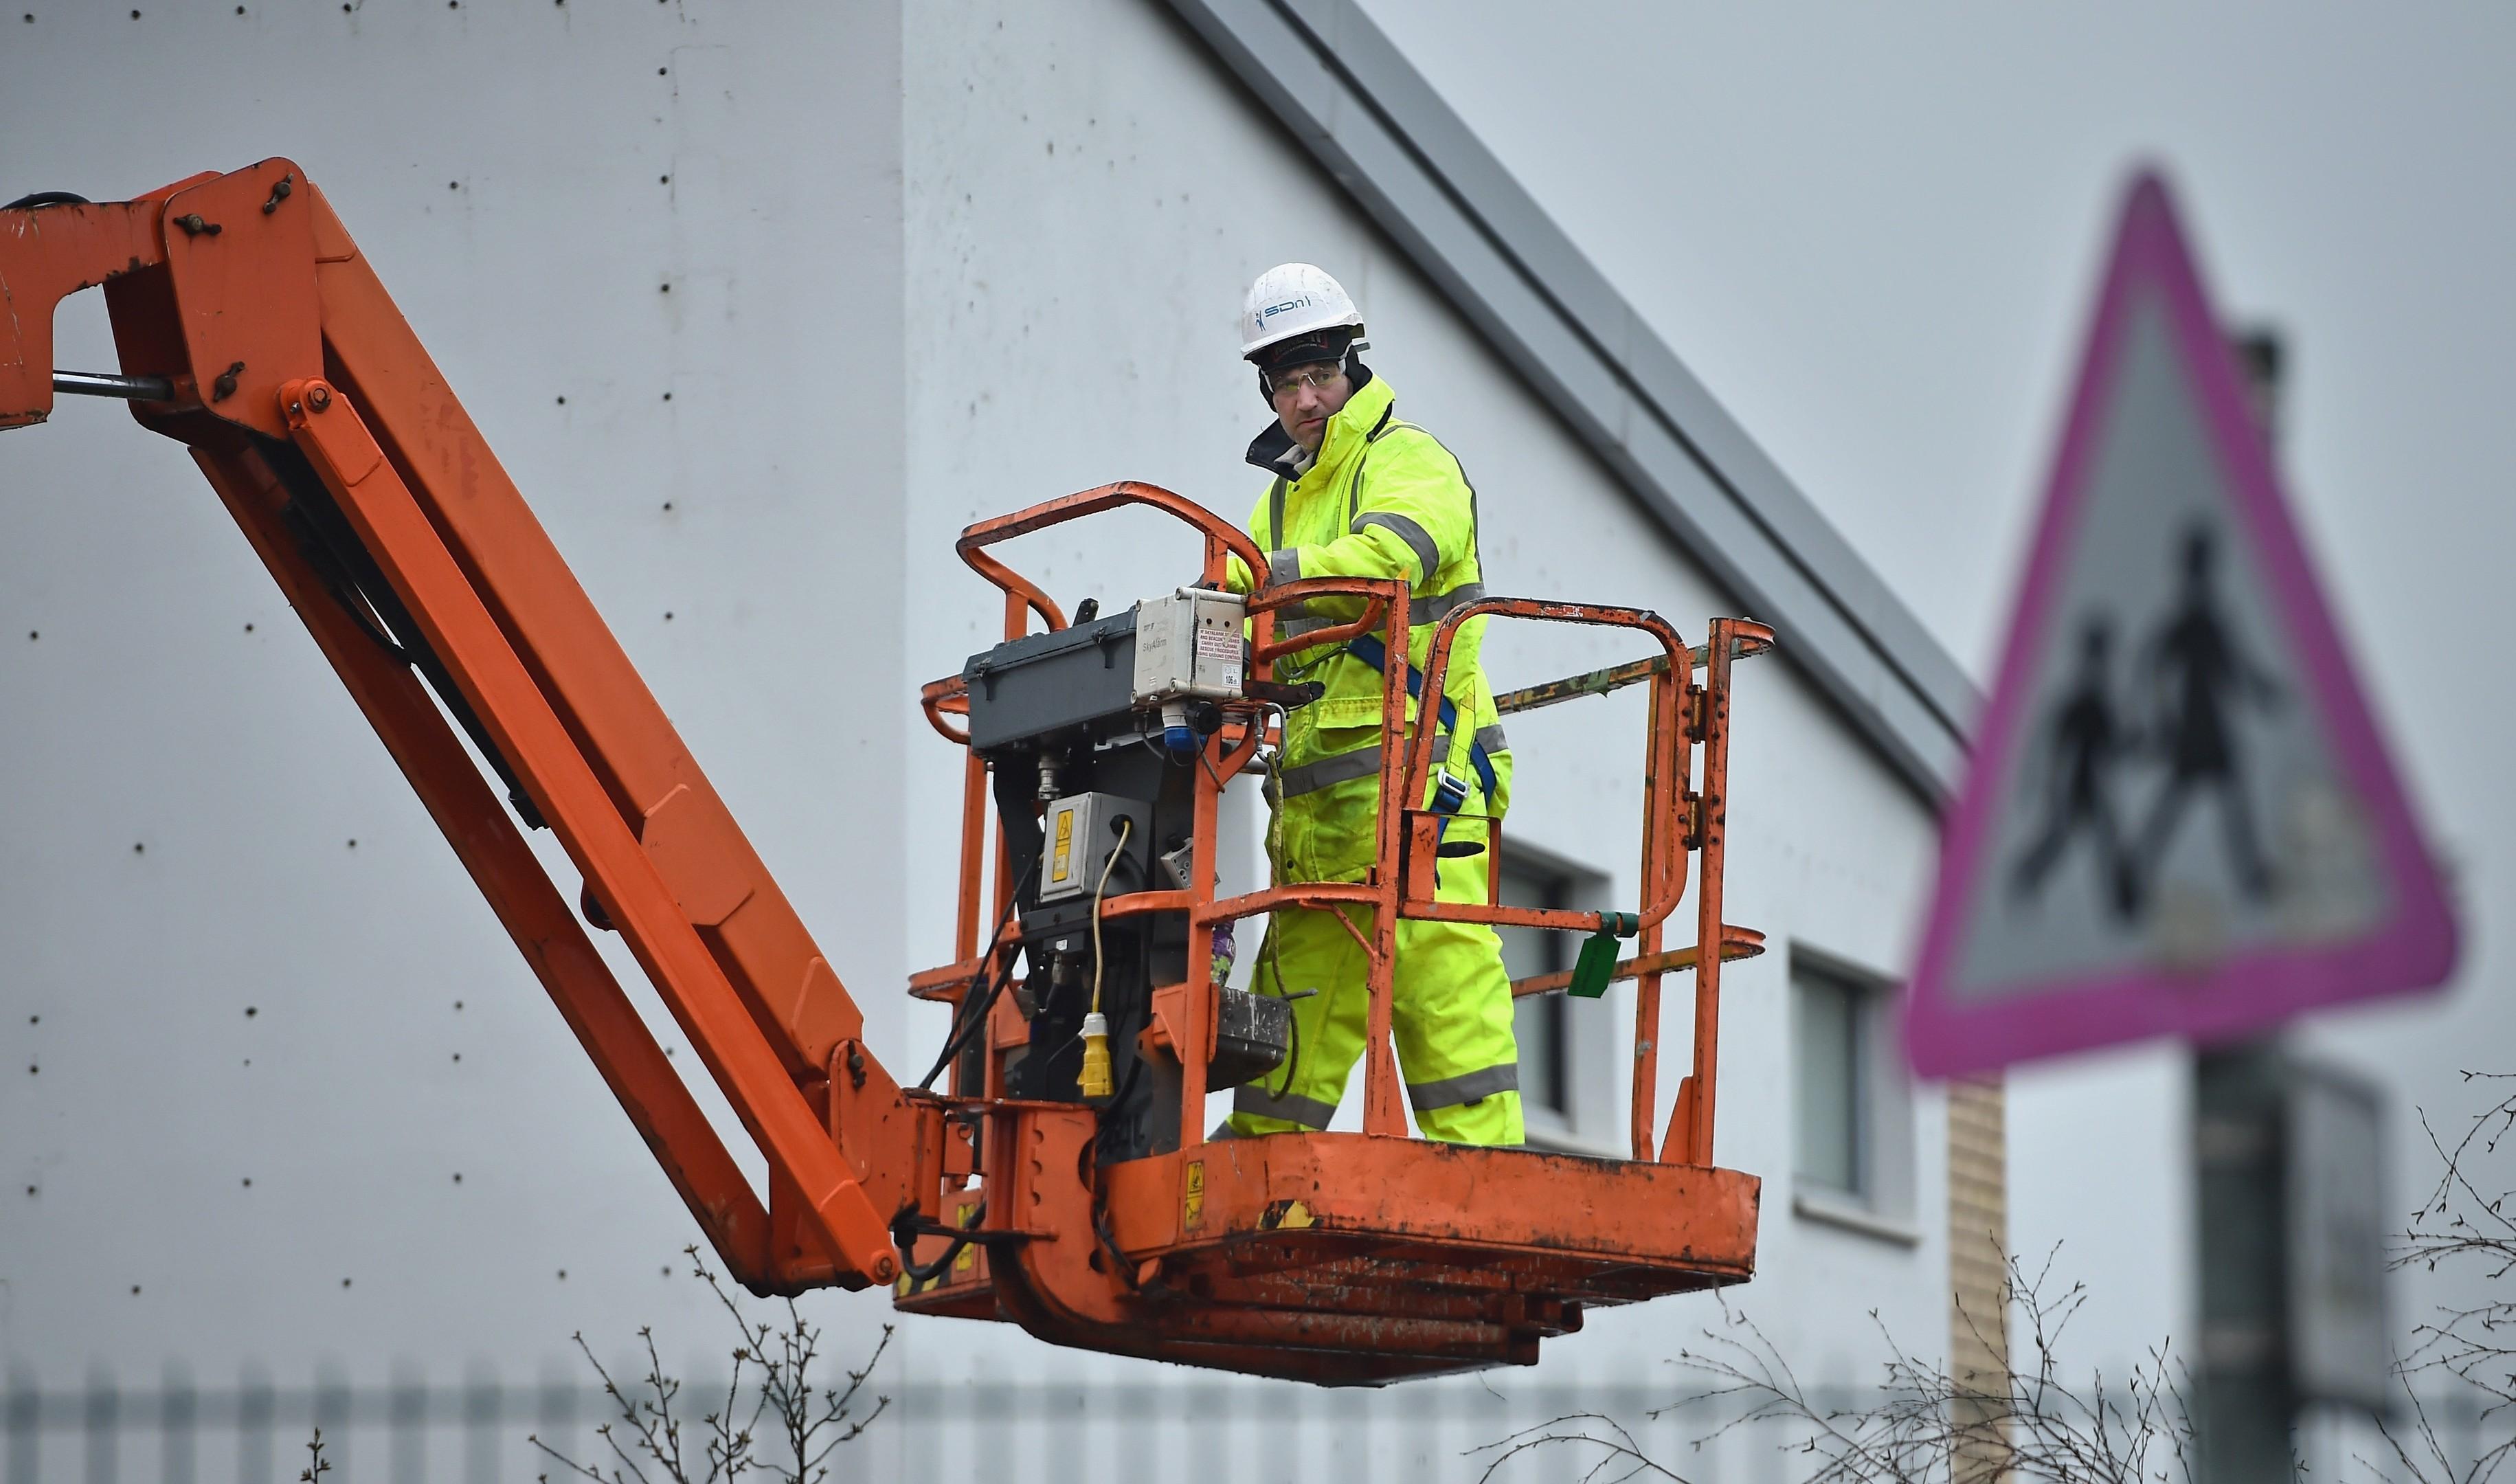 Workmen carry out repairs at Oxgangs Primary School in Edinburgh.